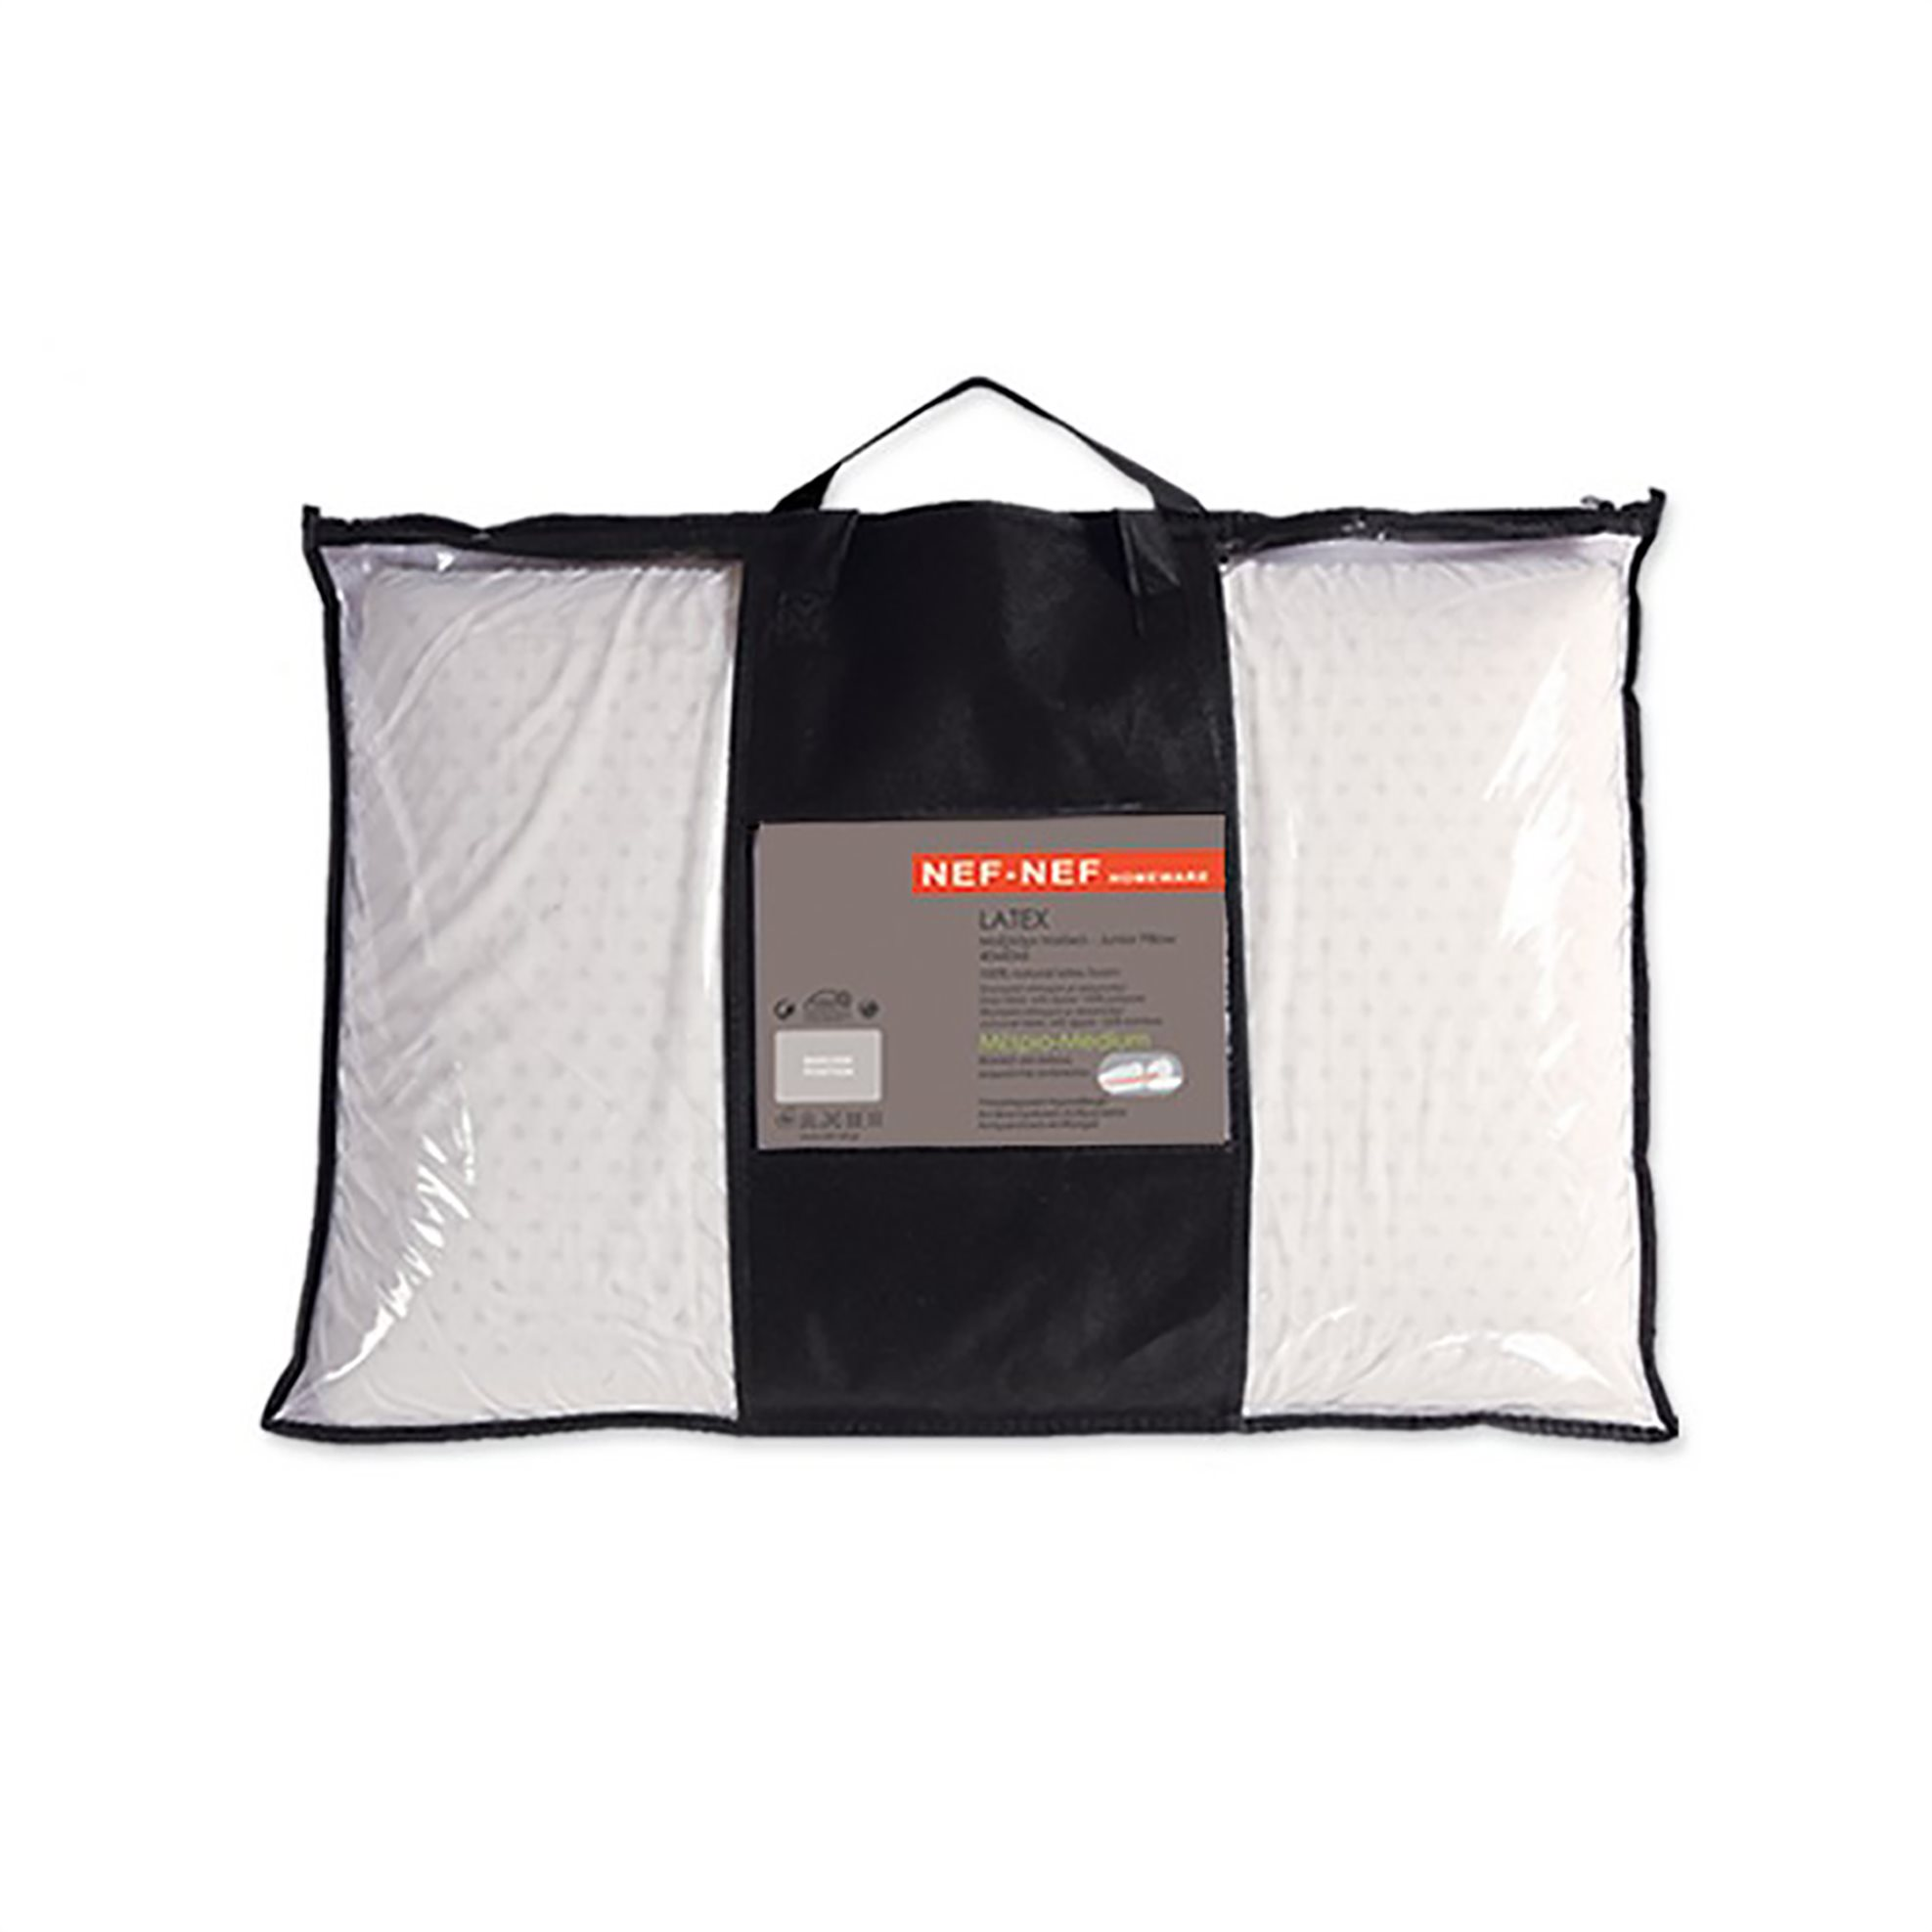 NEF-NEF Παιδικό μαξιλάρι latex (60x40x6) - 017275 - Λευκό home   παιδια   μαξιλάρια